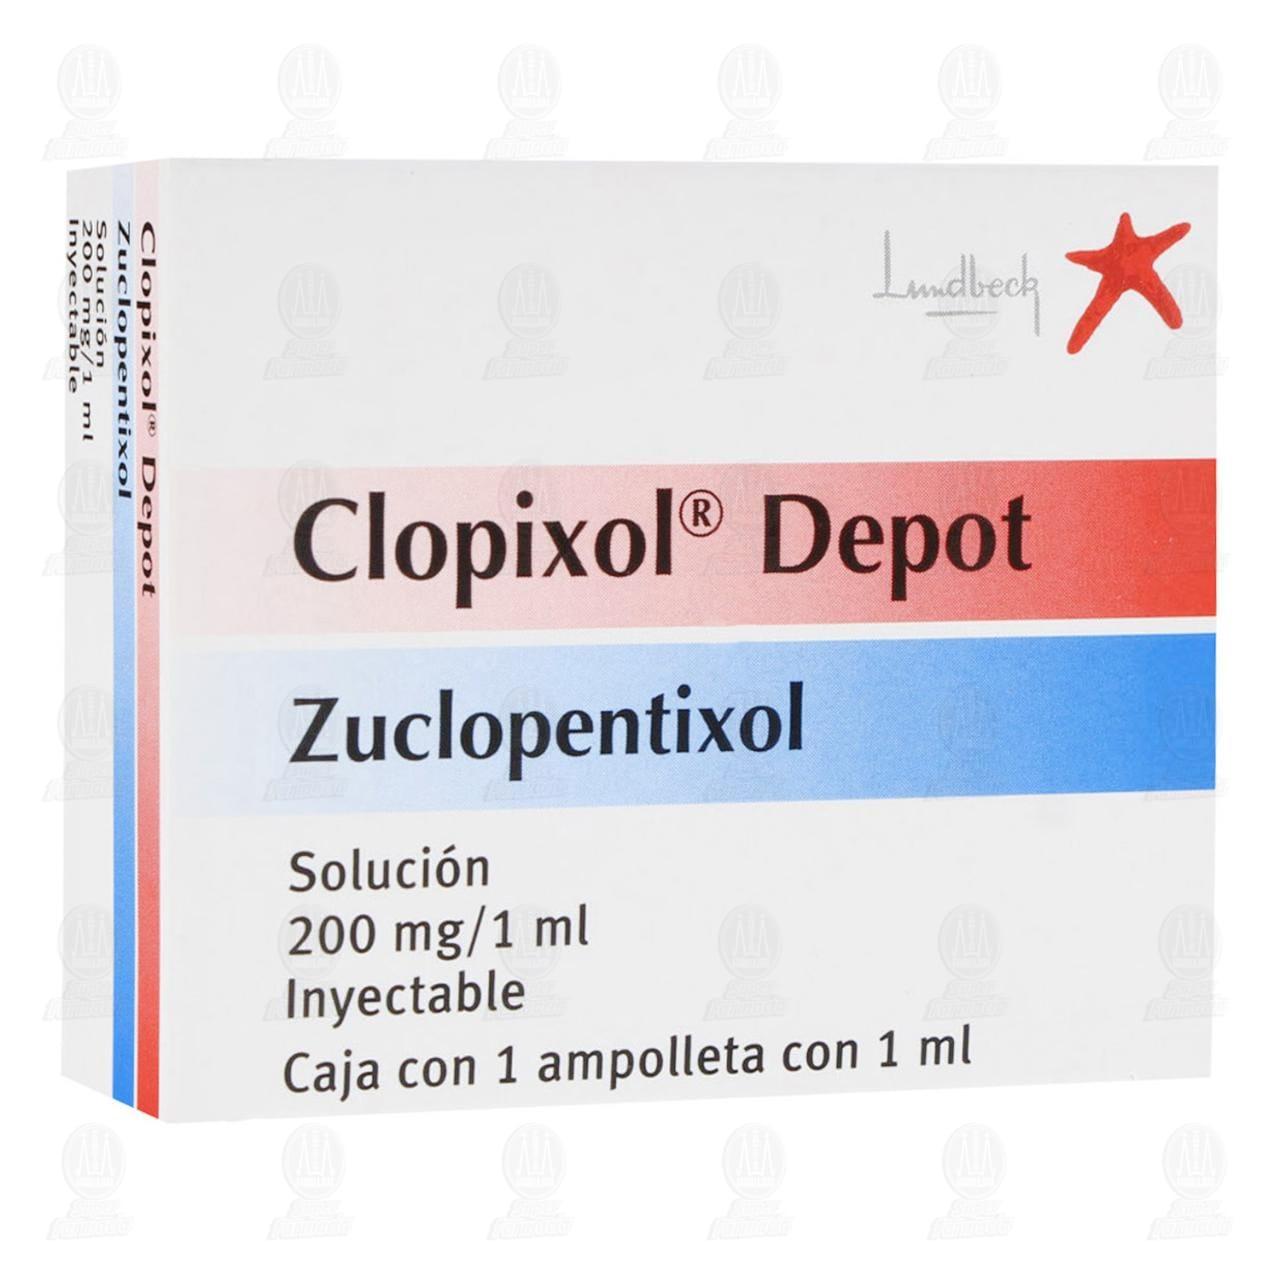 Comprar Clopixol Depot 200mg/1ml Solución Inyectable 1 Ampolleta 1ml en Farmacias Guadalajara